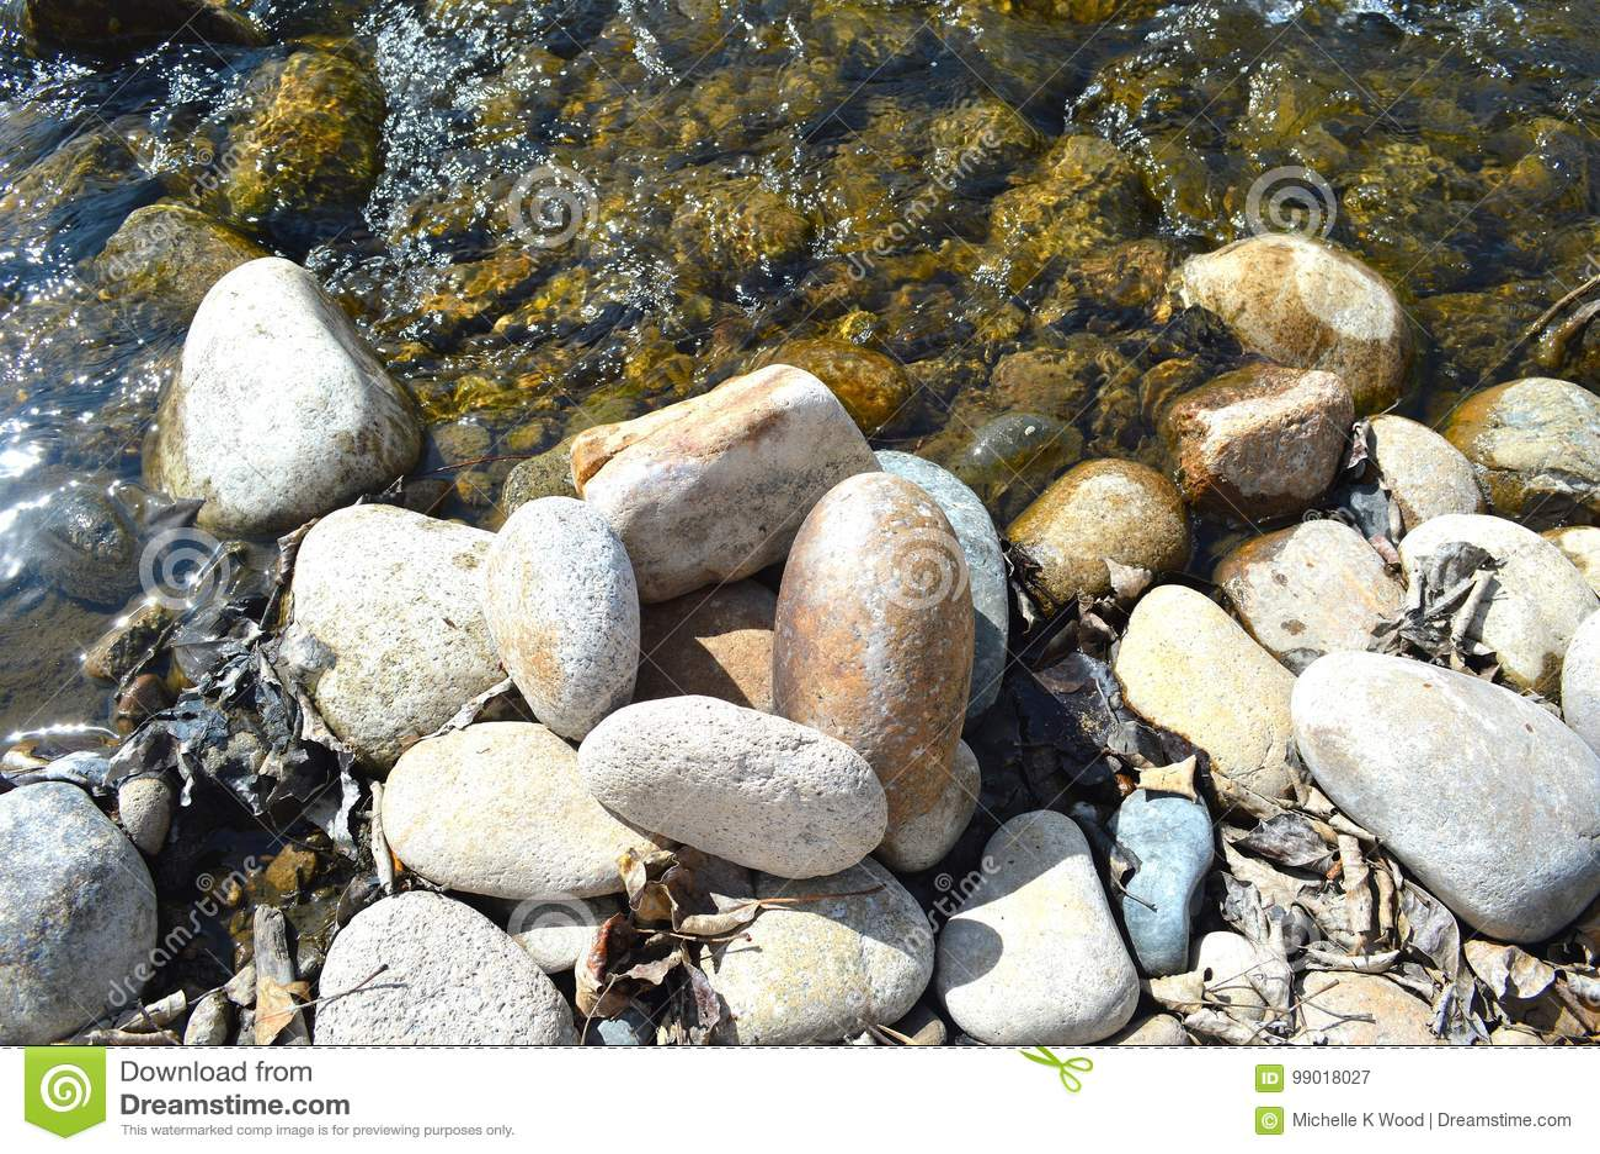 River rocks in sparkling water